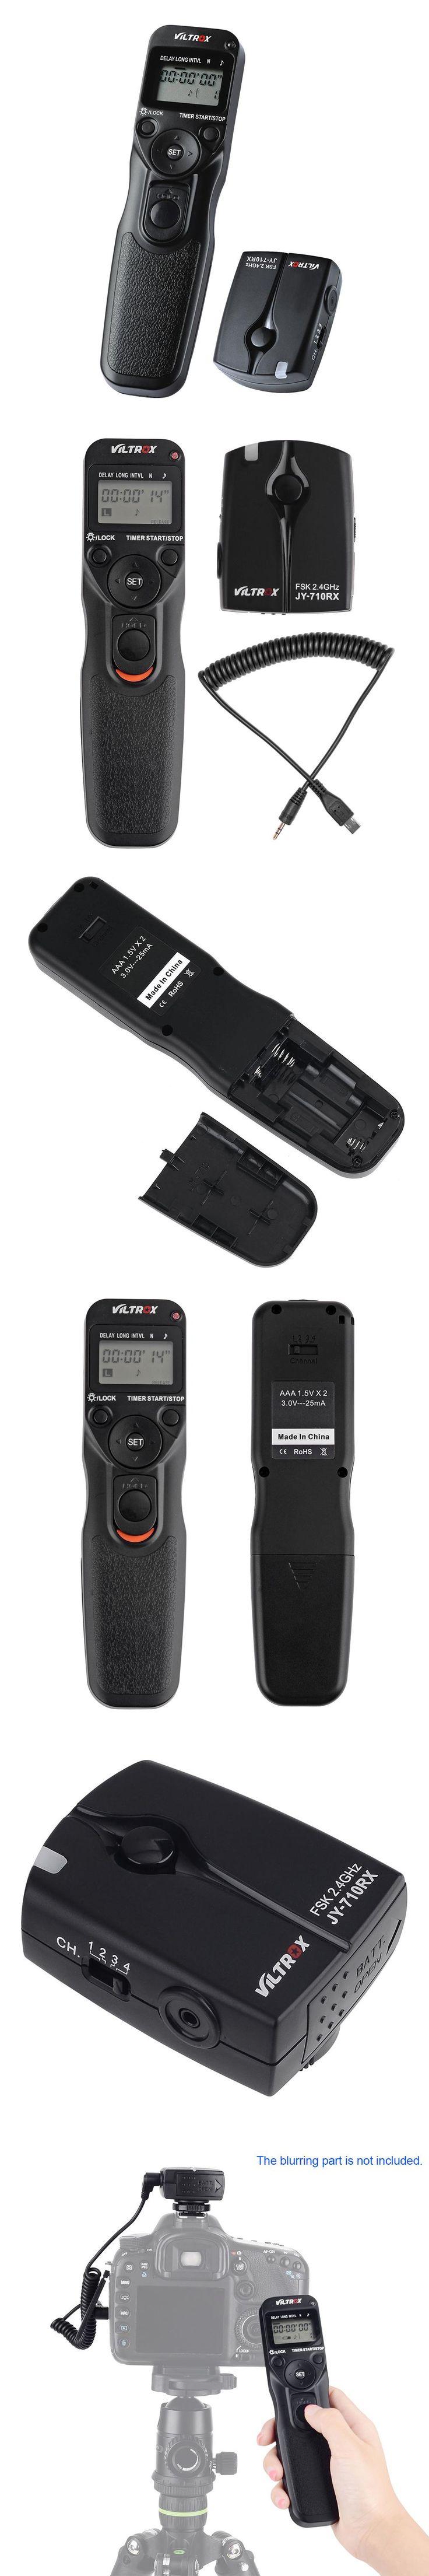 VILTROX JY710-S2 LCD Shutter Release Camera Timer Remote Wireless Controller for Sony A7RII A7M2 NEX-3N A6000 HX400 RX100M2M3M4